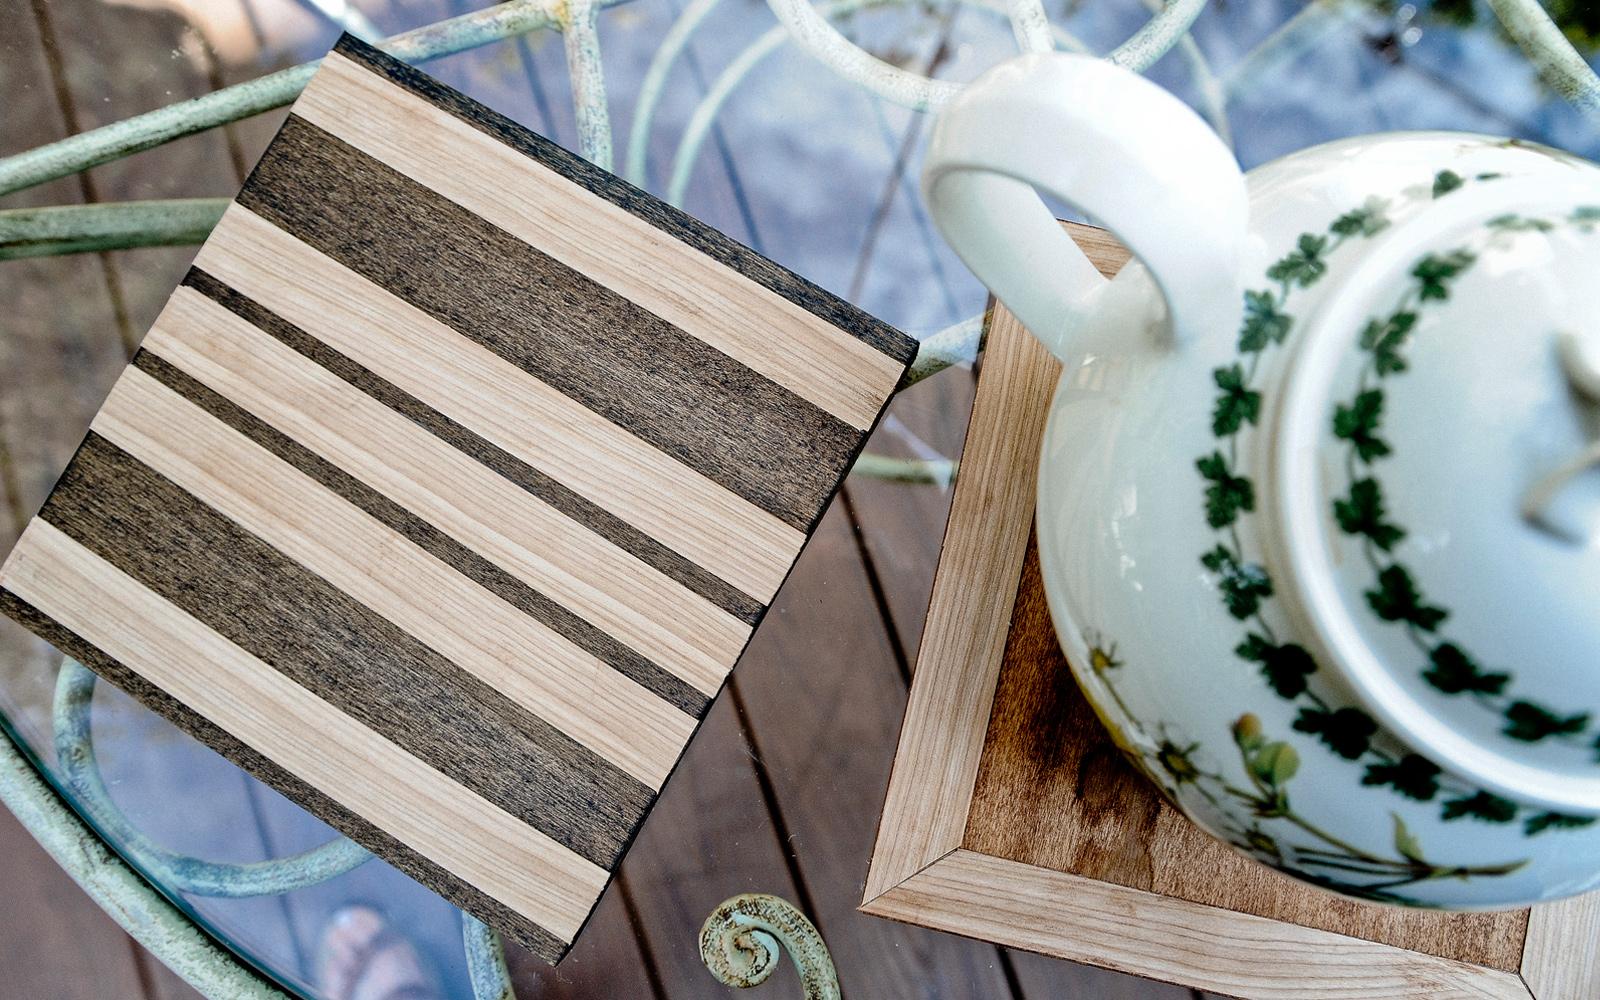 How To Make Diy Wood Trivets Wooden Trivets Dunn Diy